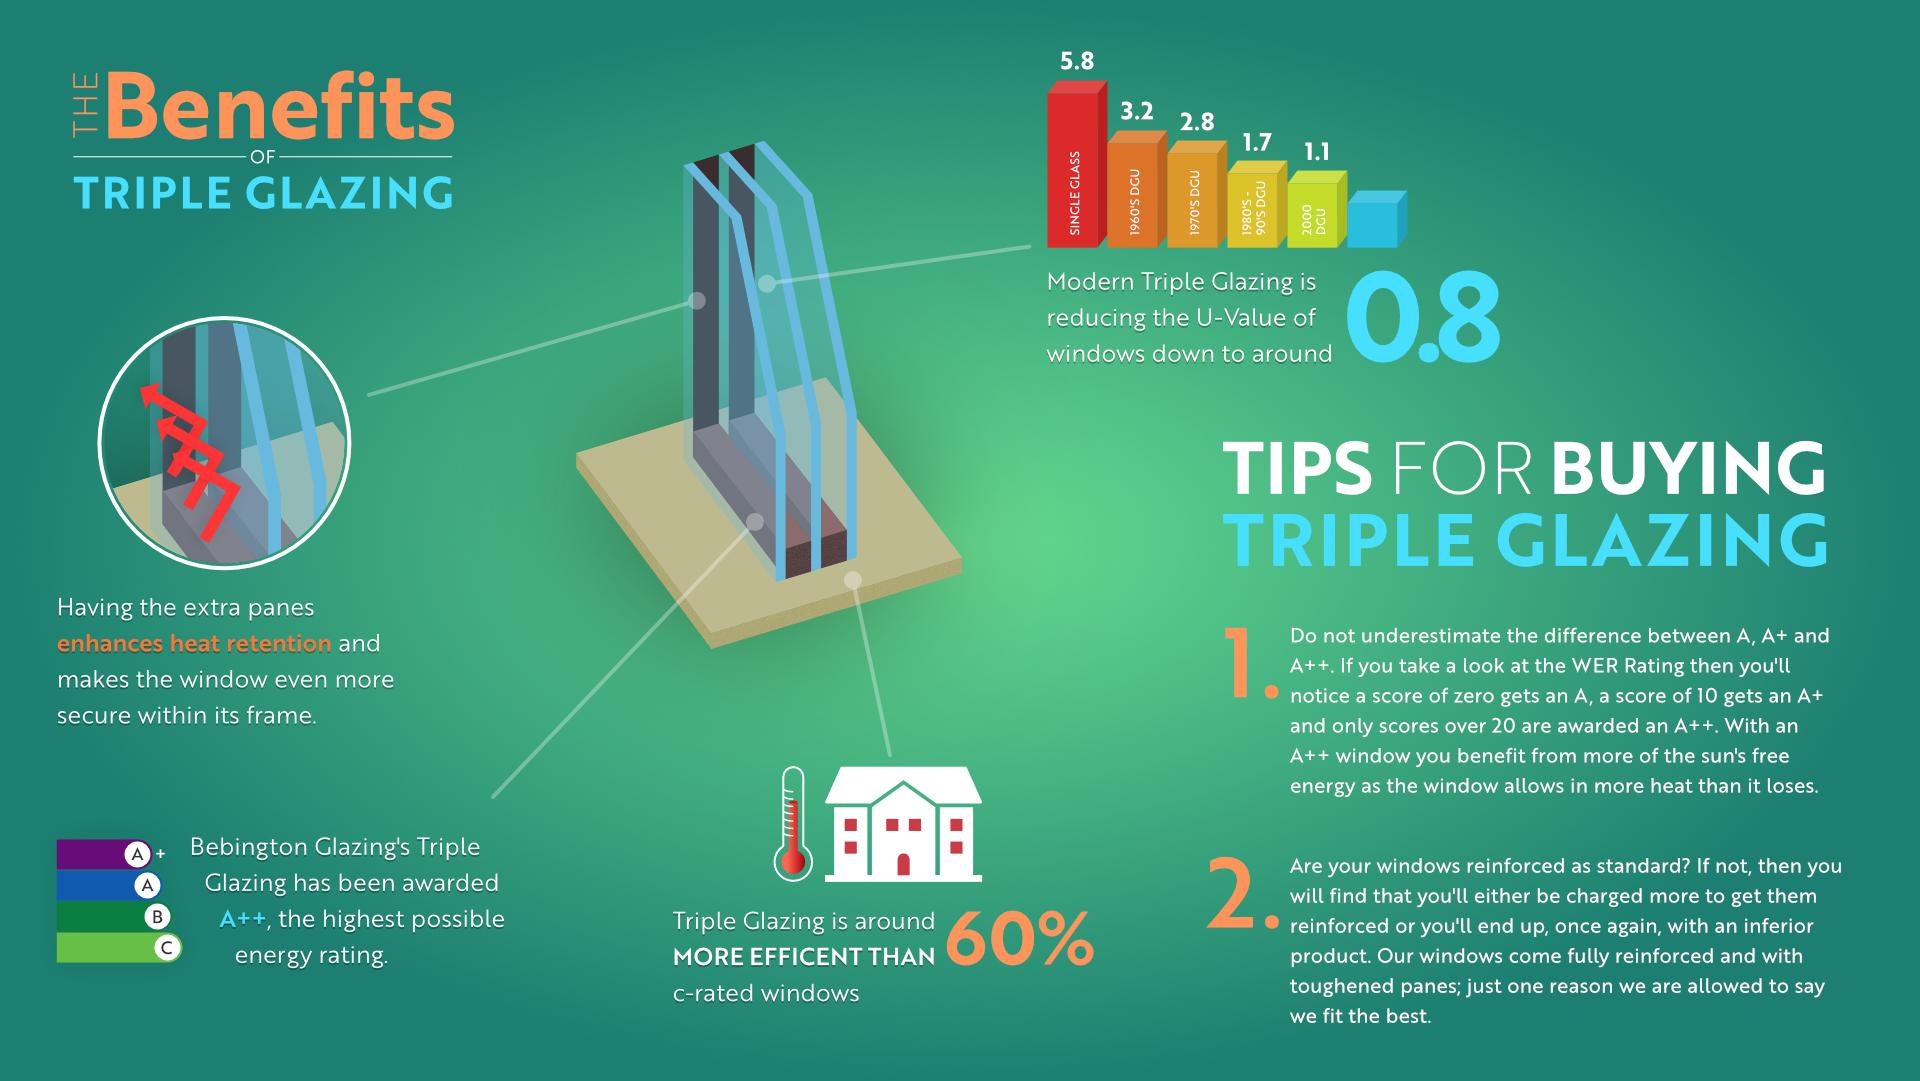 Benefits Triple Glazing